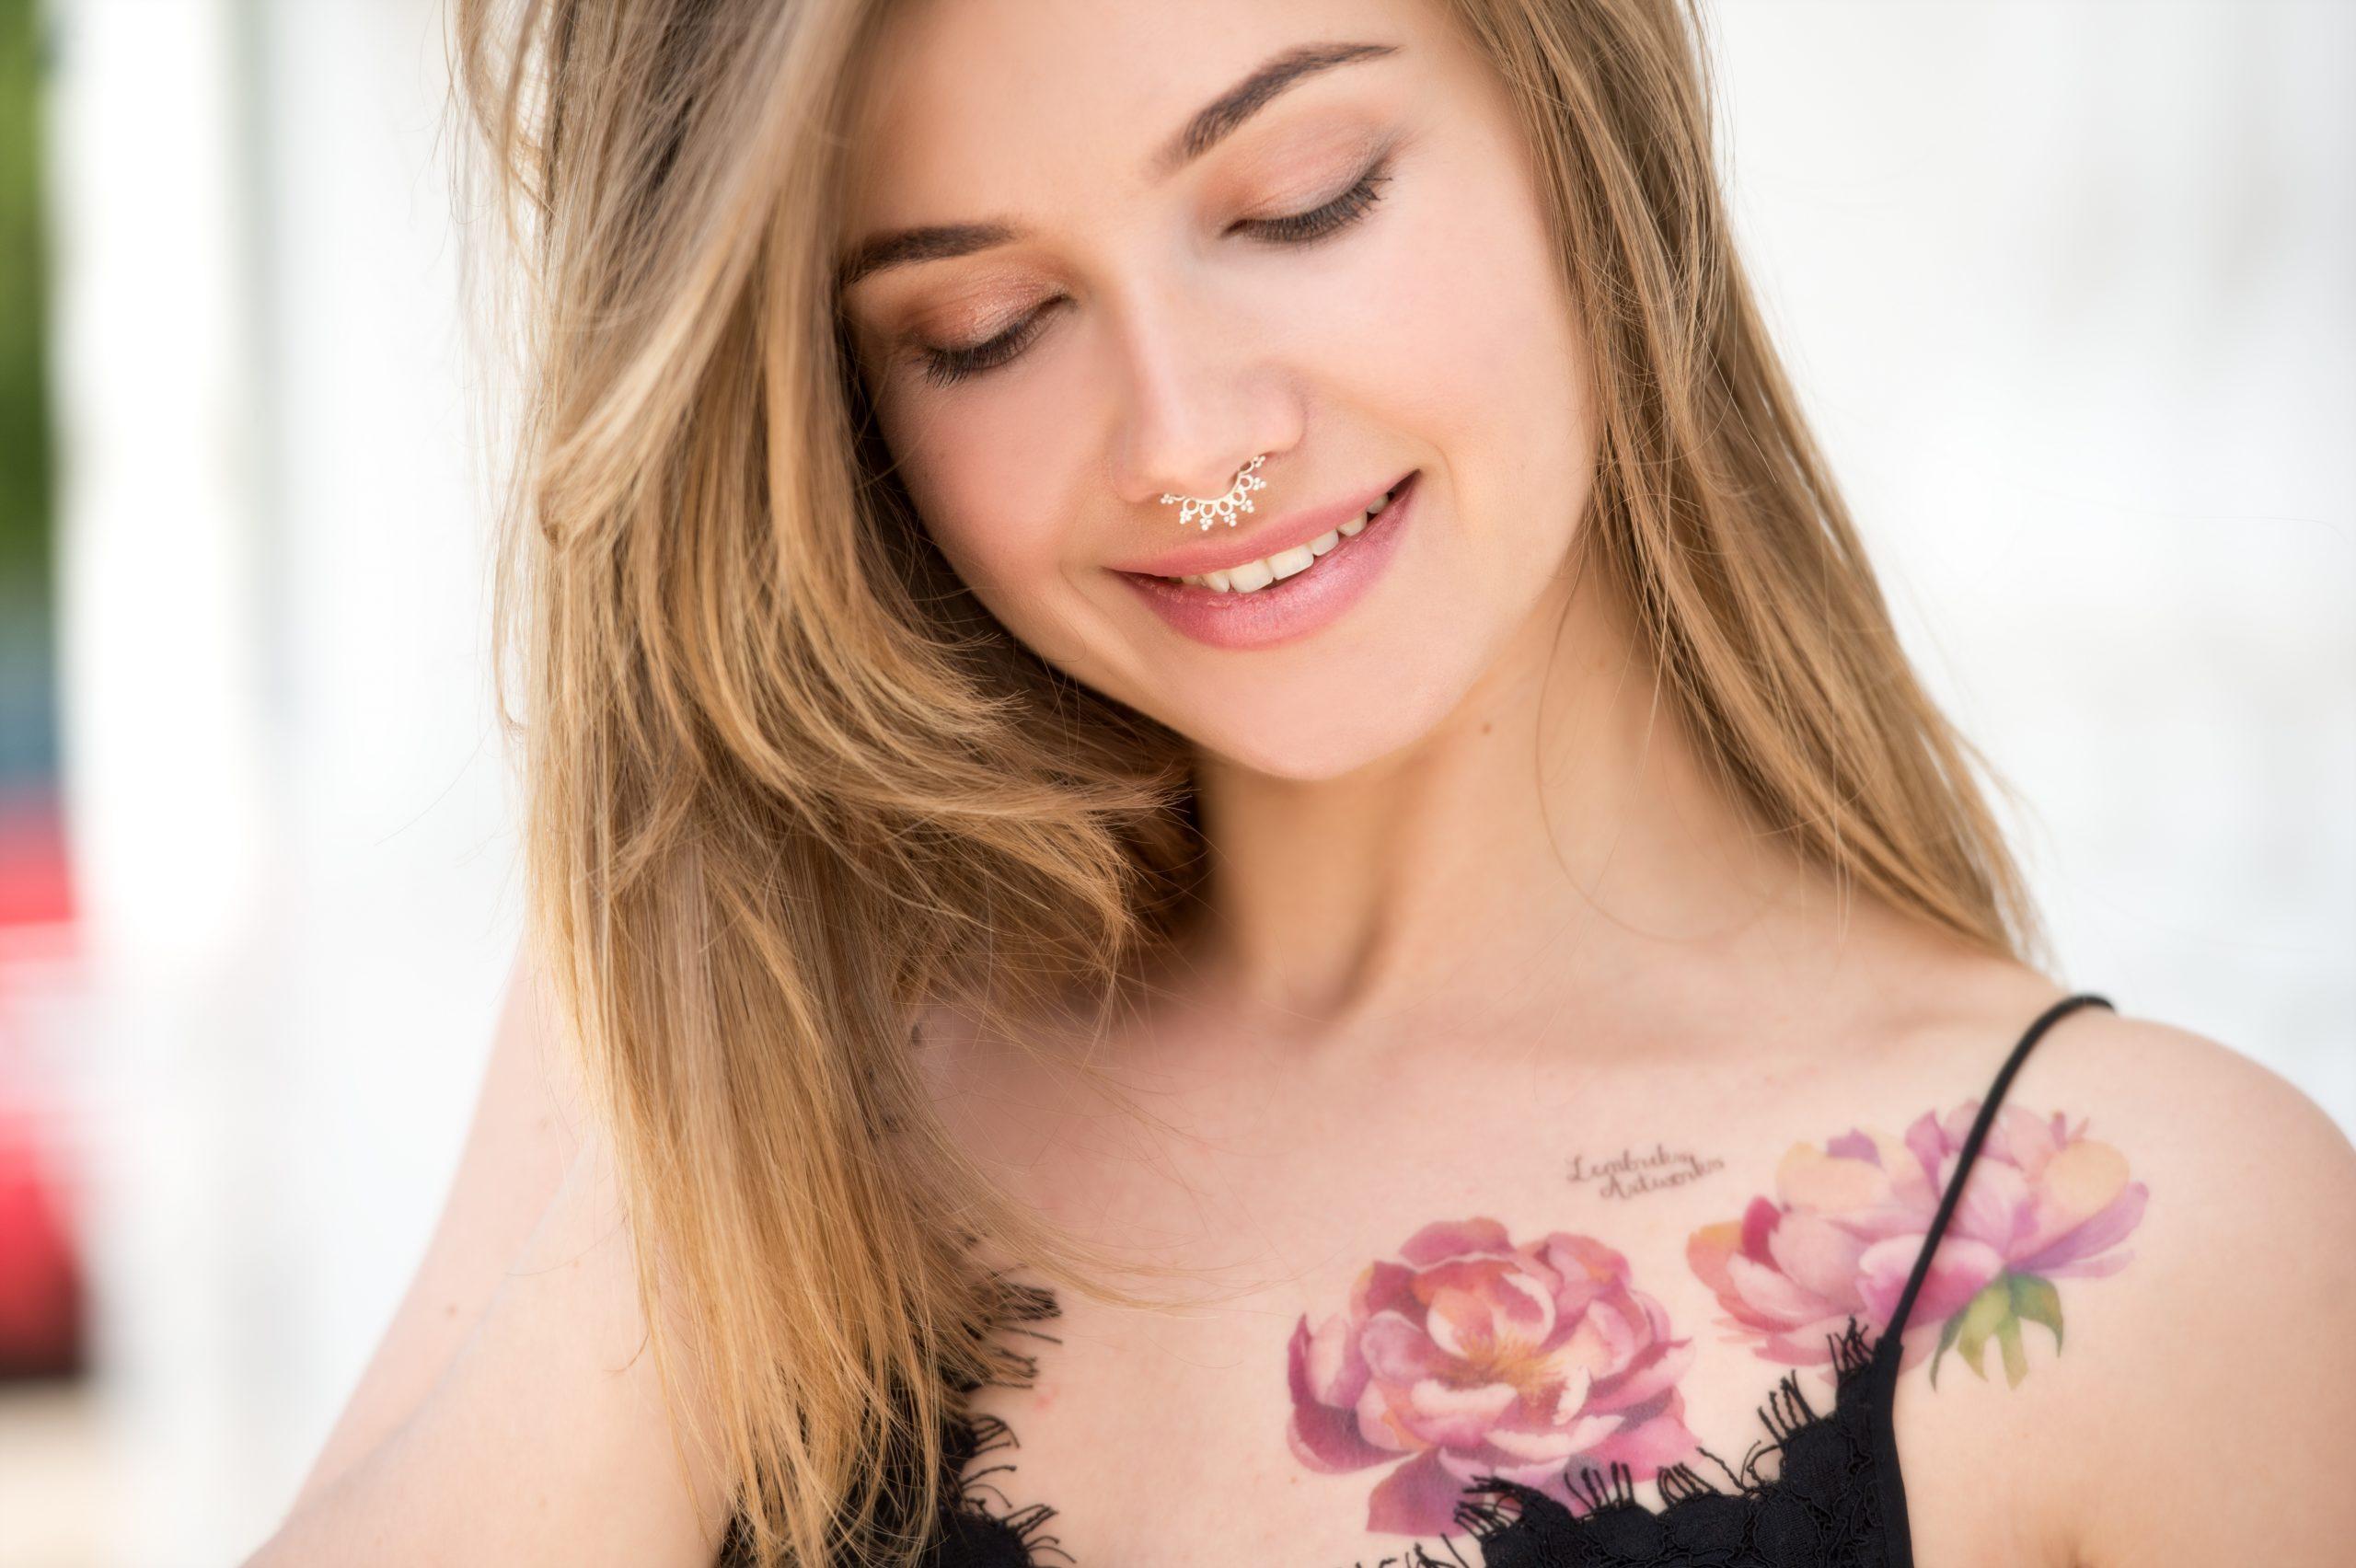 Girl tattooed